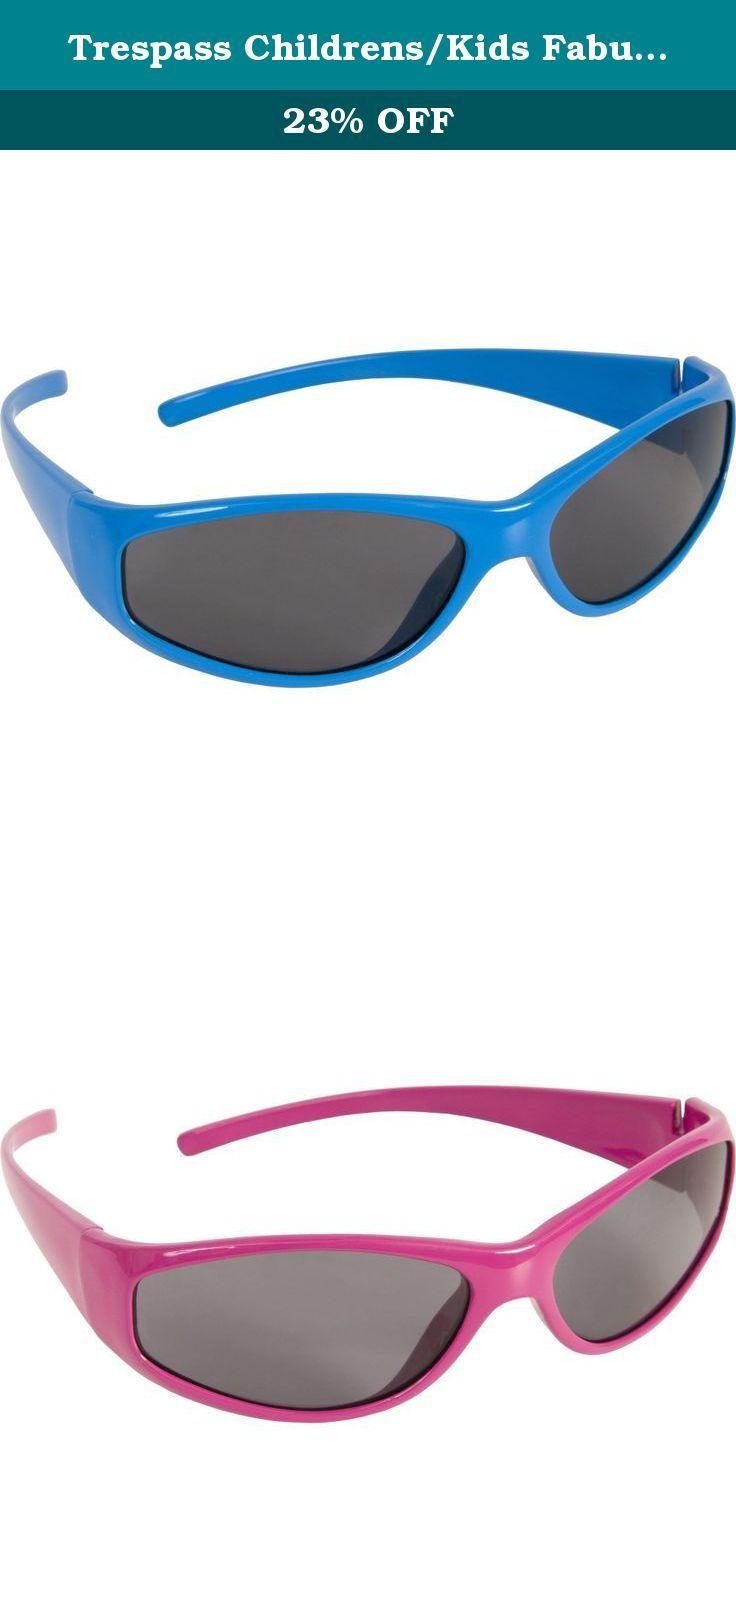 bada71398ec5 Trespass Childrens/Kids Fabulous Sunglasses (One Size) (Blue). Kids  sunglasses. UV Protection 400. Product conforms to EC Standard EN 1836 -  1997.